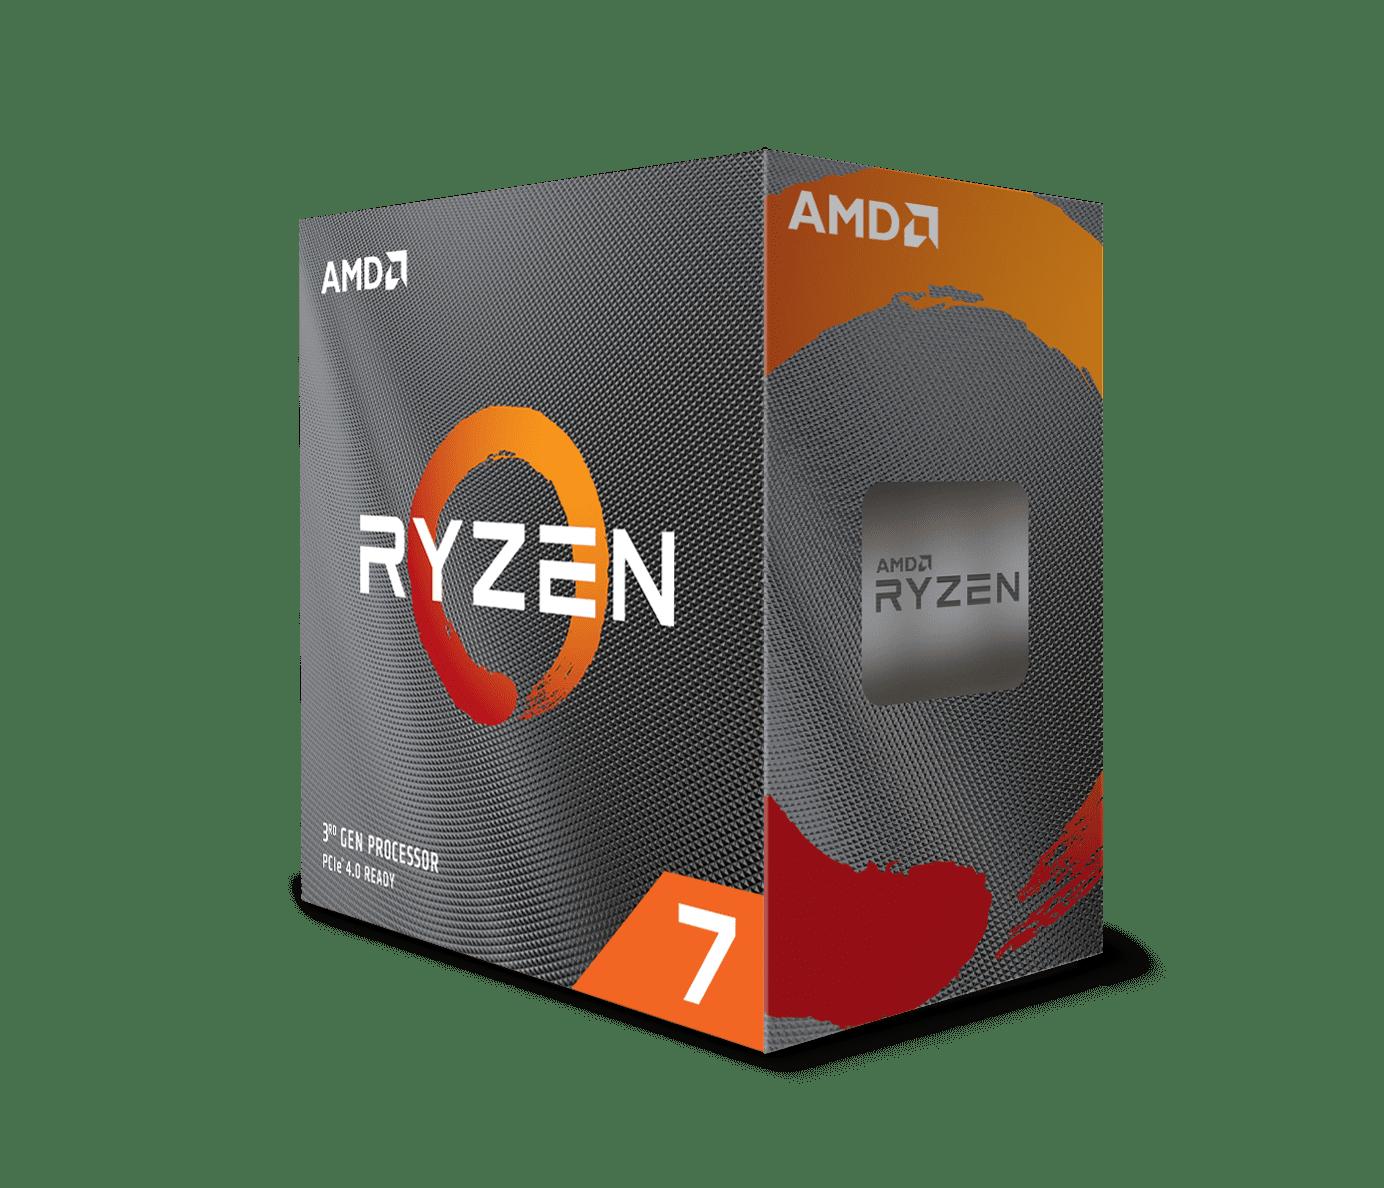 Amd Ryzen 7 3800xt 8 Core 16 Thread Unlocked Desktop Processor Without Cooler Walmart Com Walmart Com